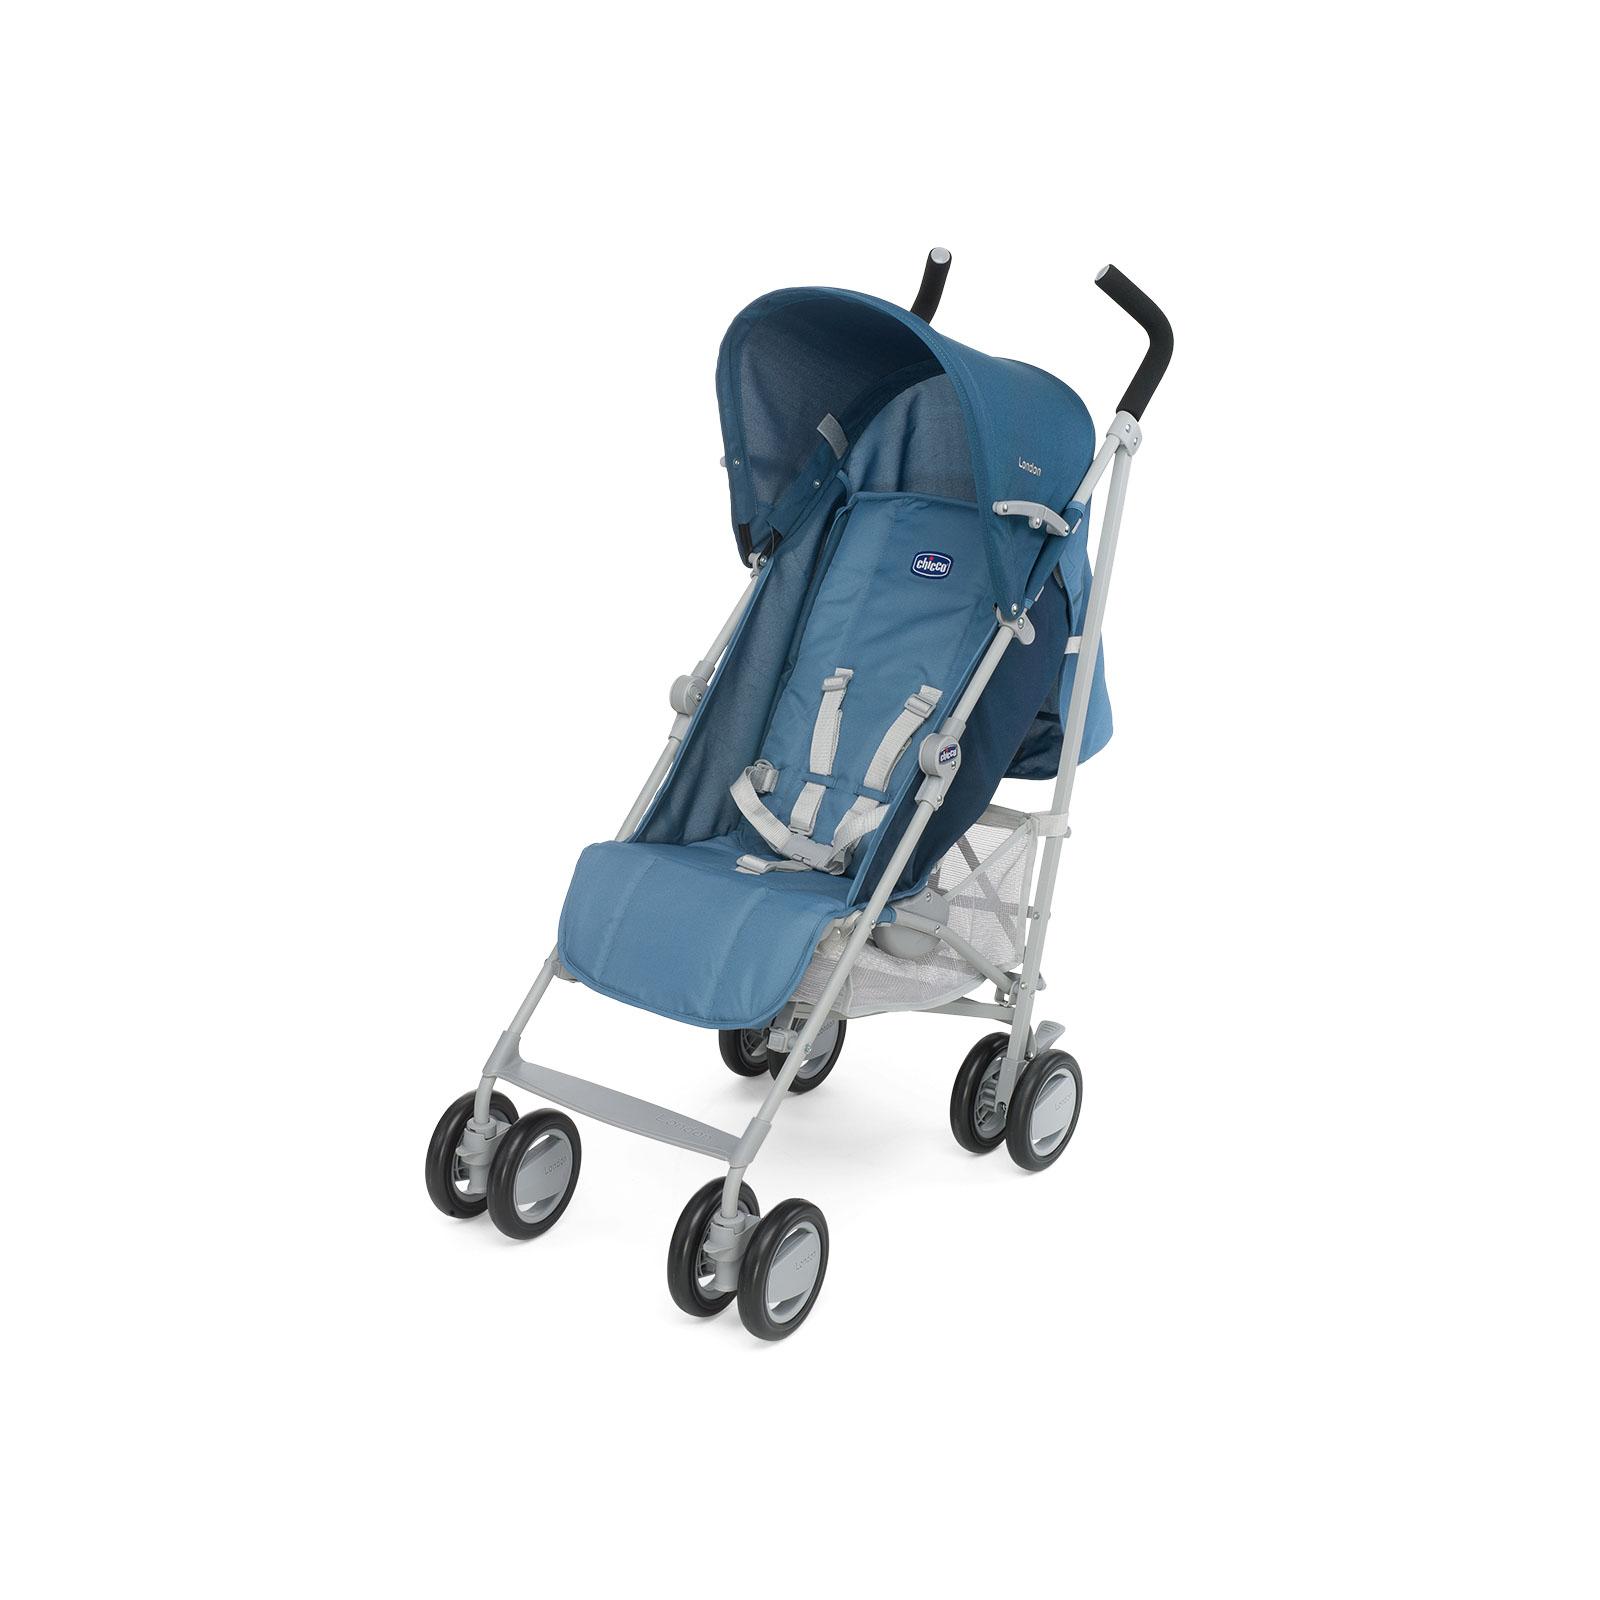 Коляска Chicco London Up Stroller Blue (79251.80)